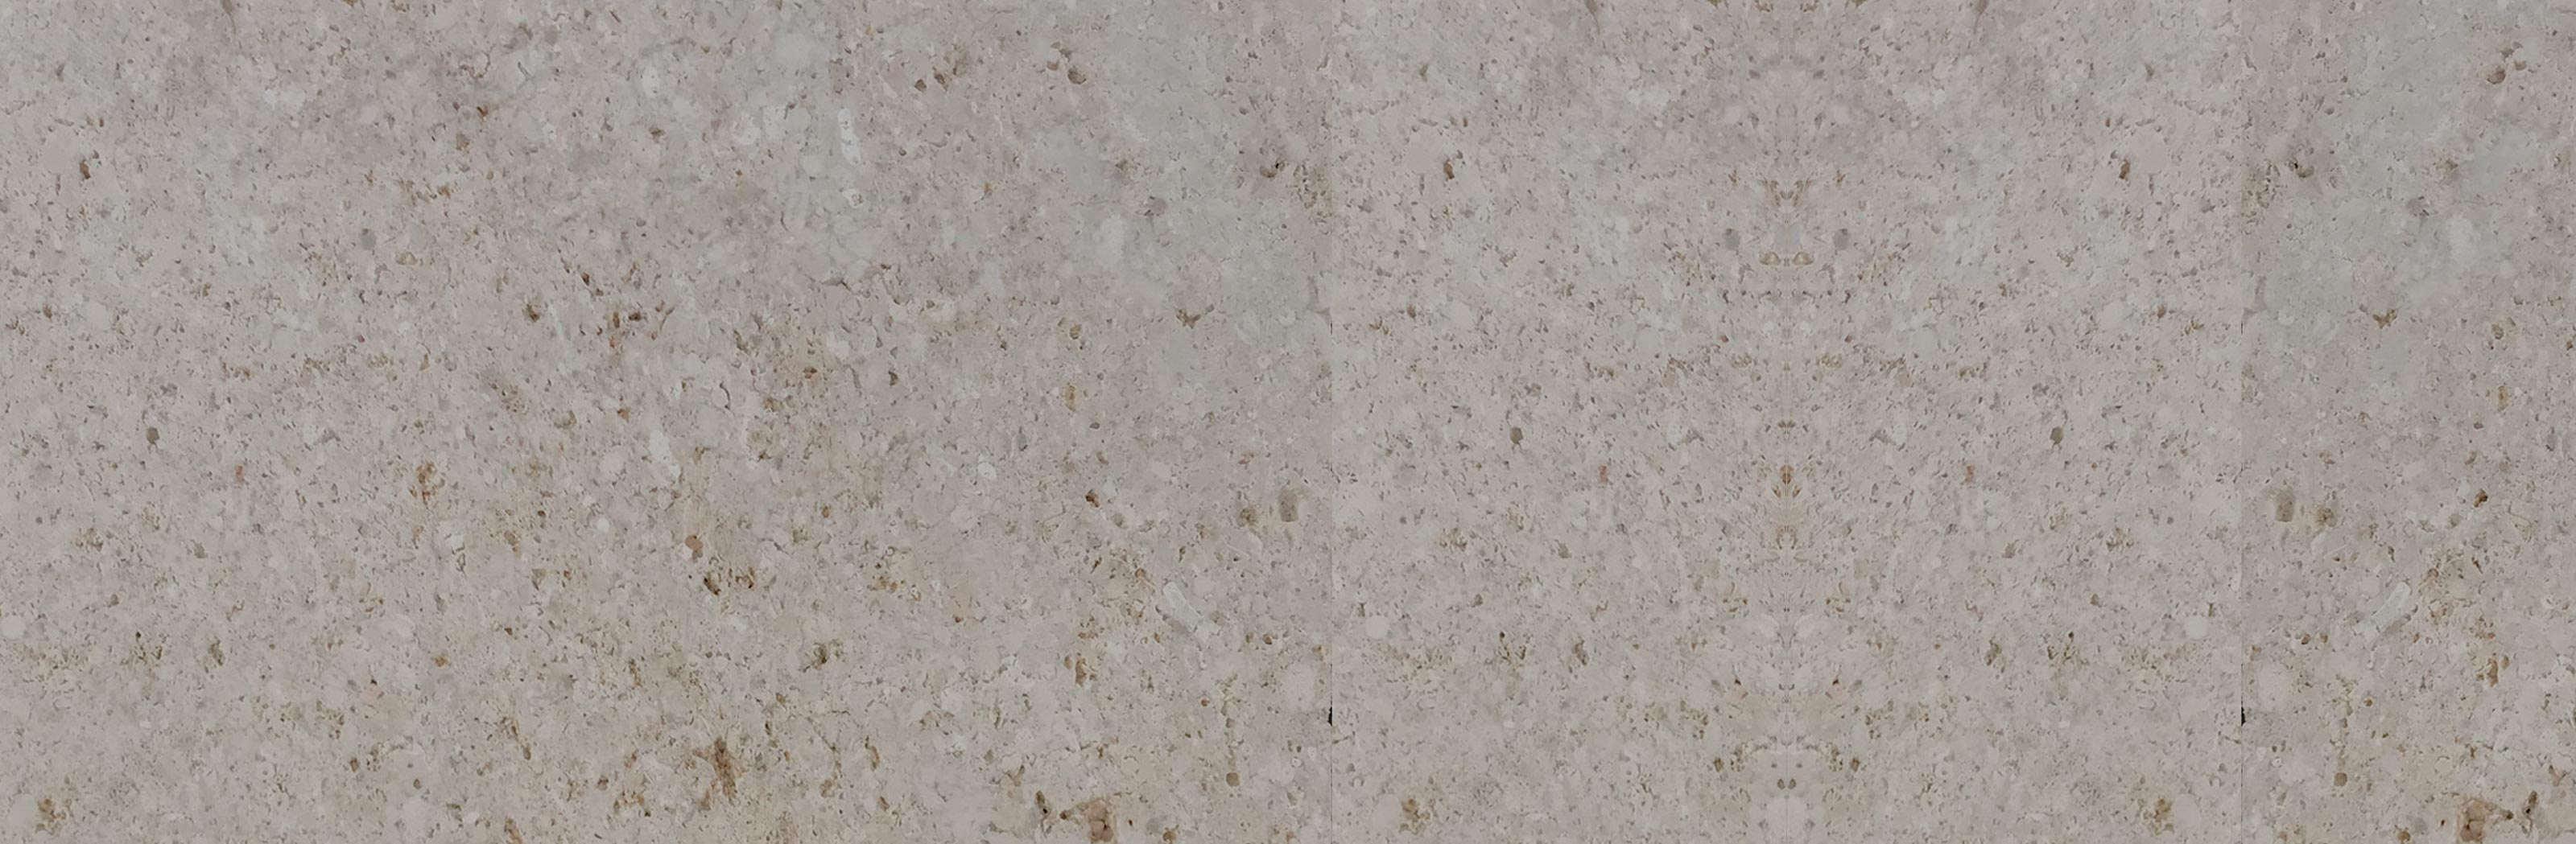 spanish limestone paving